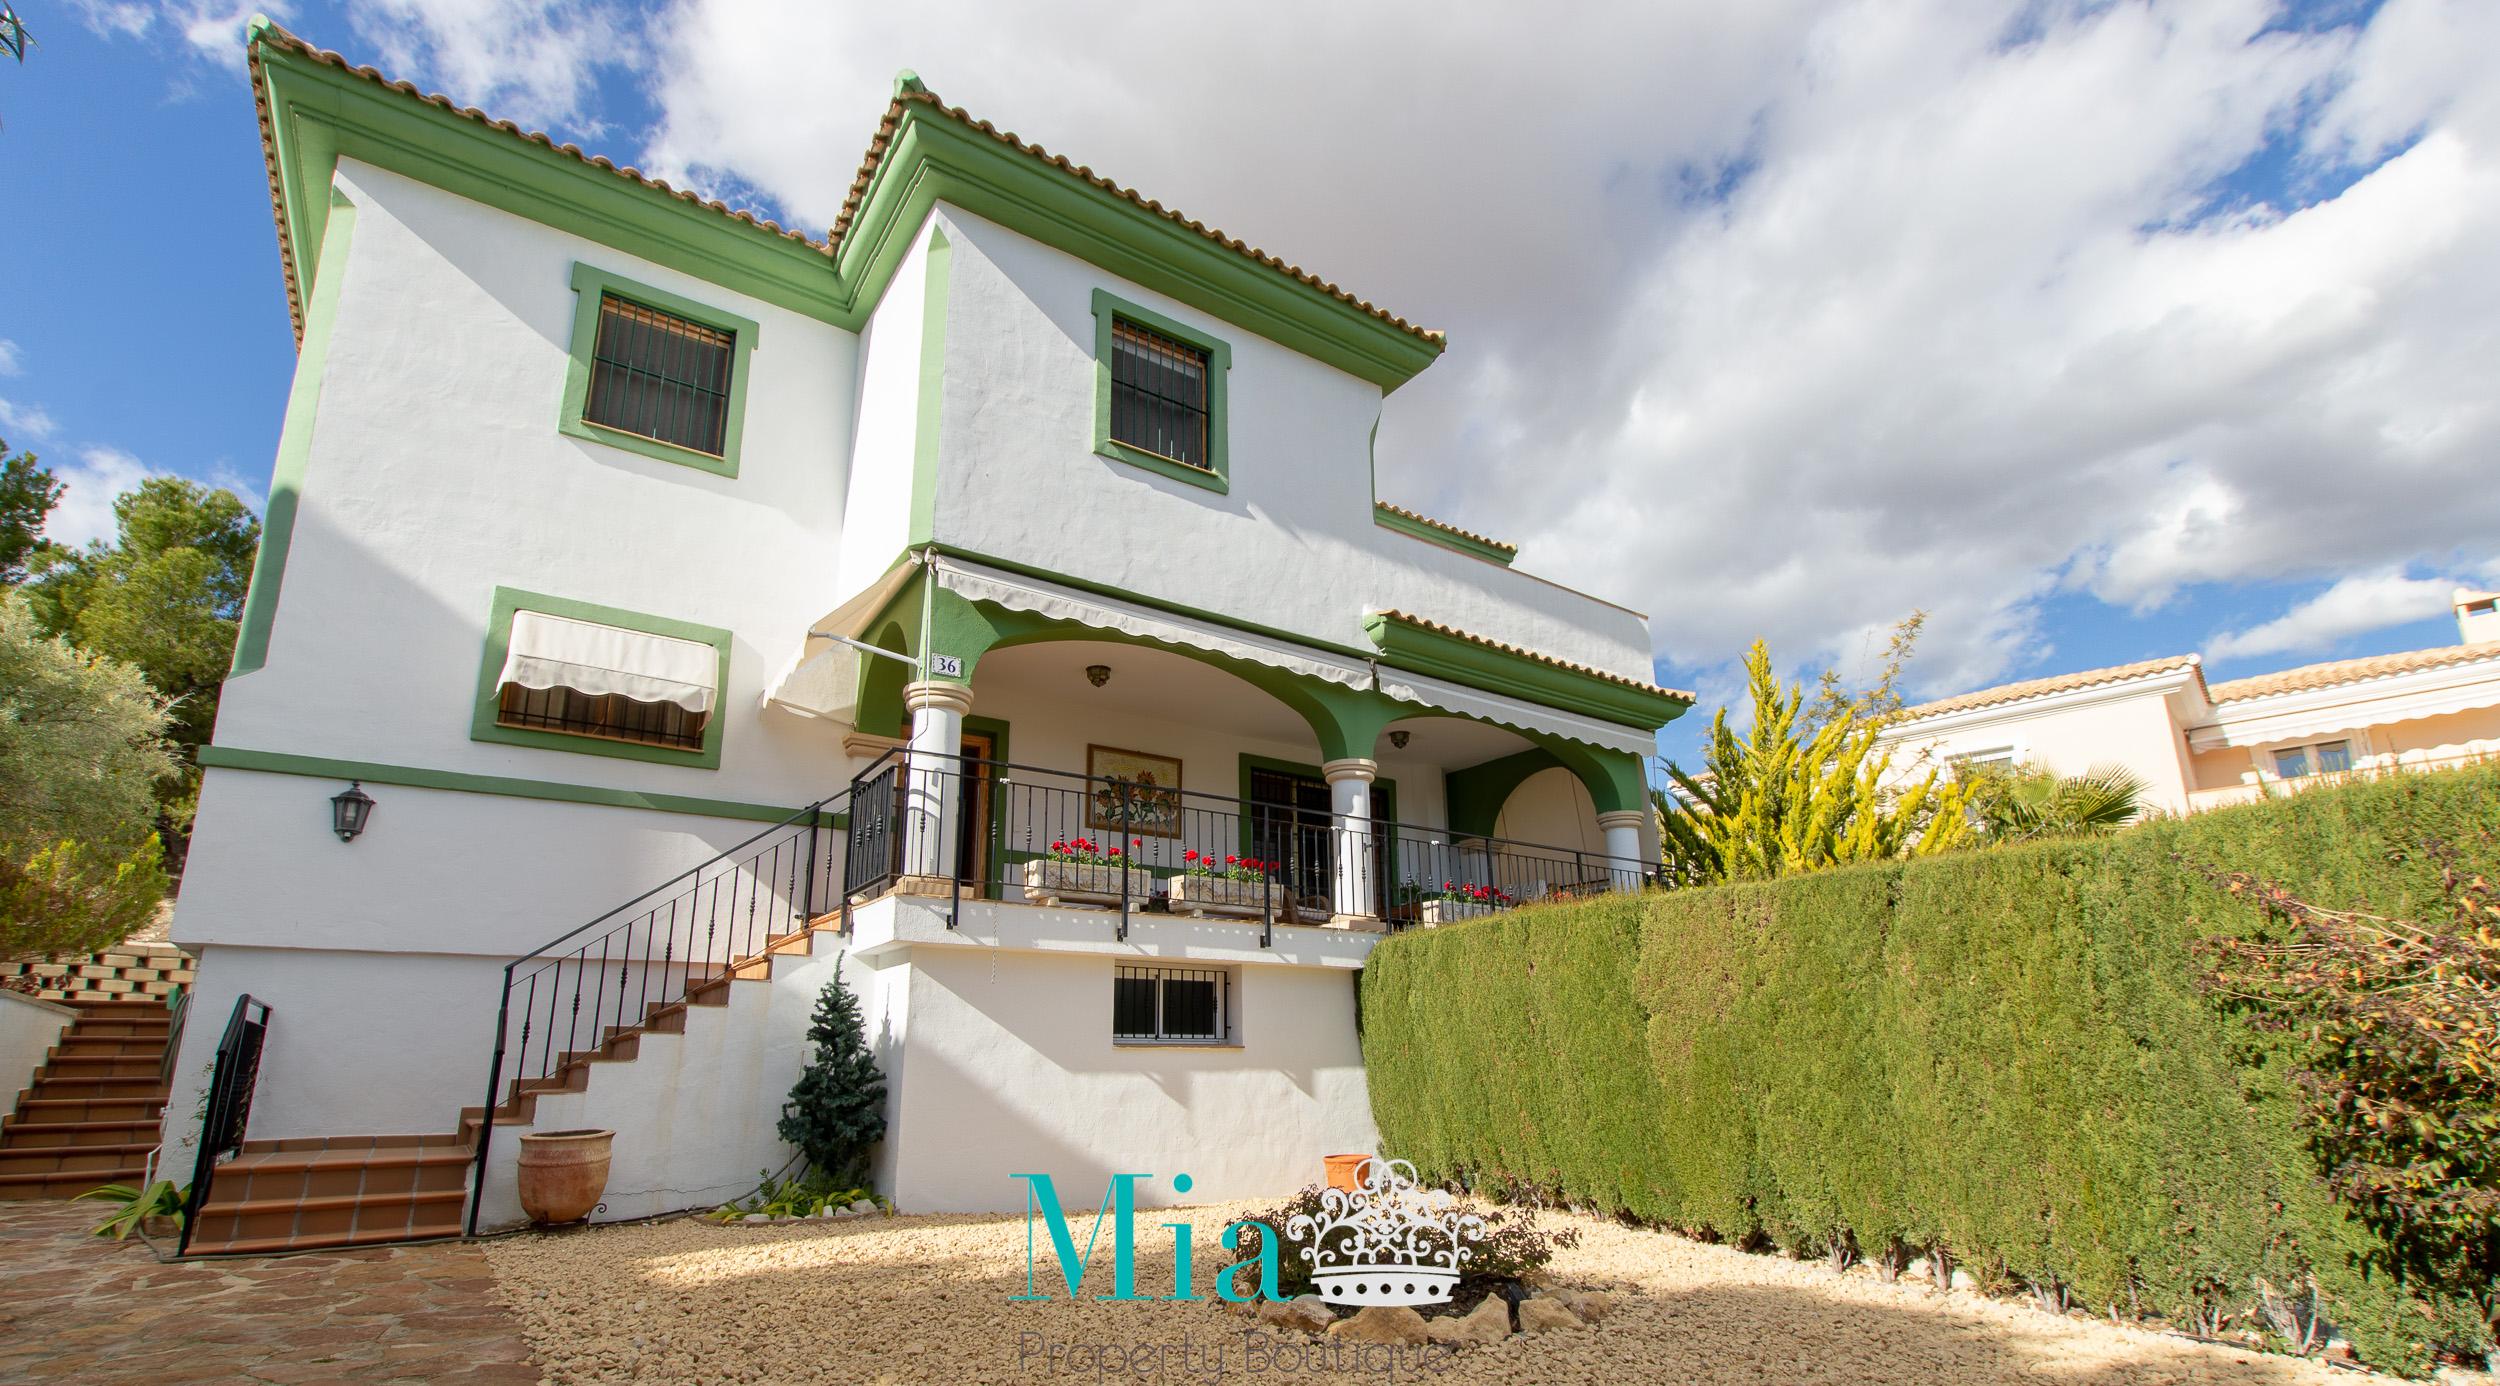 Villa with Idyllic Sea and Mountain Views, Bonalba